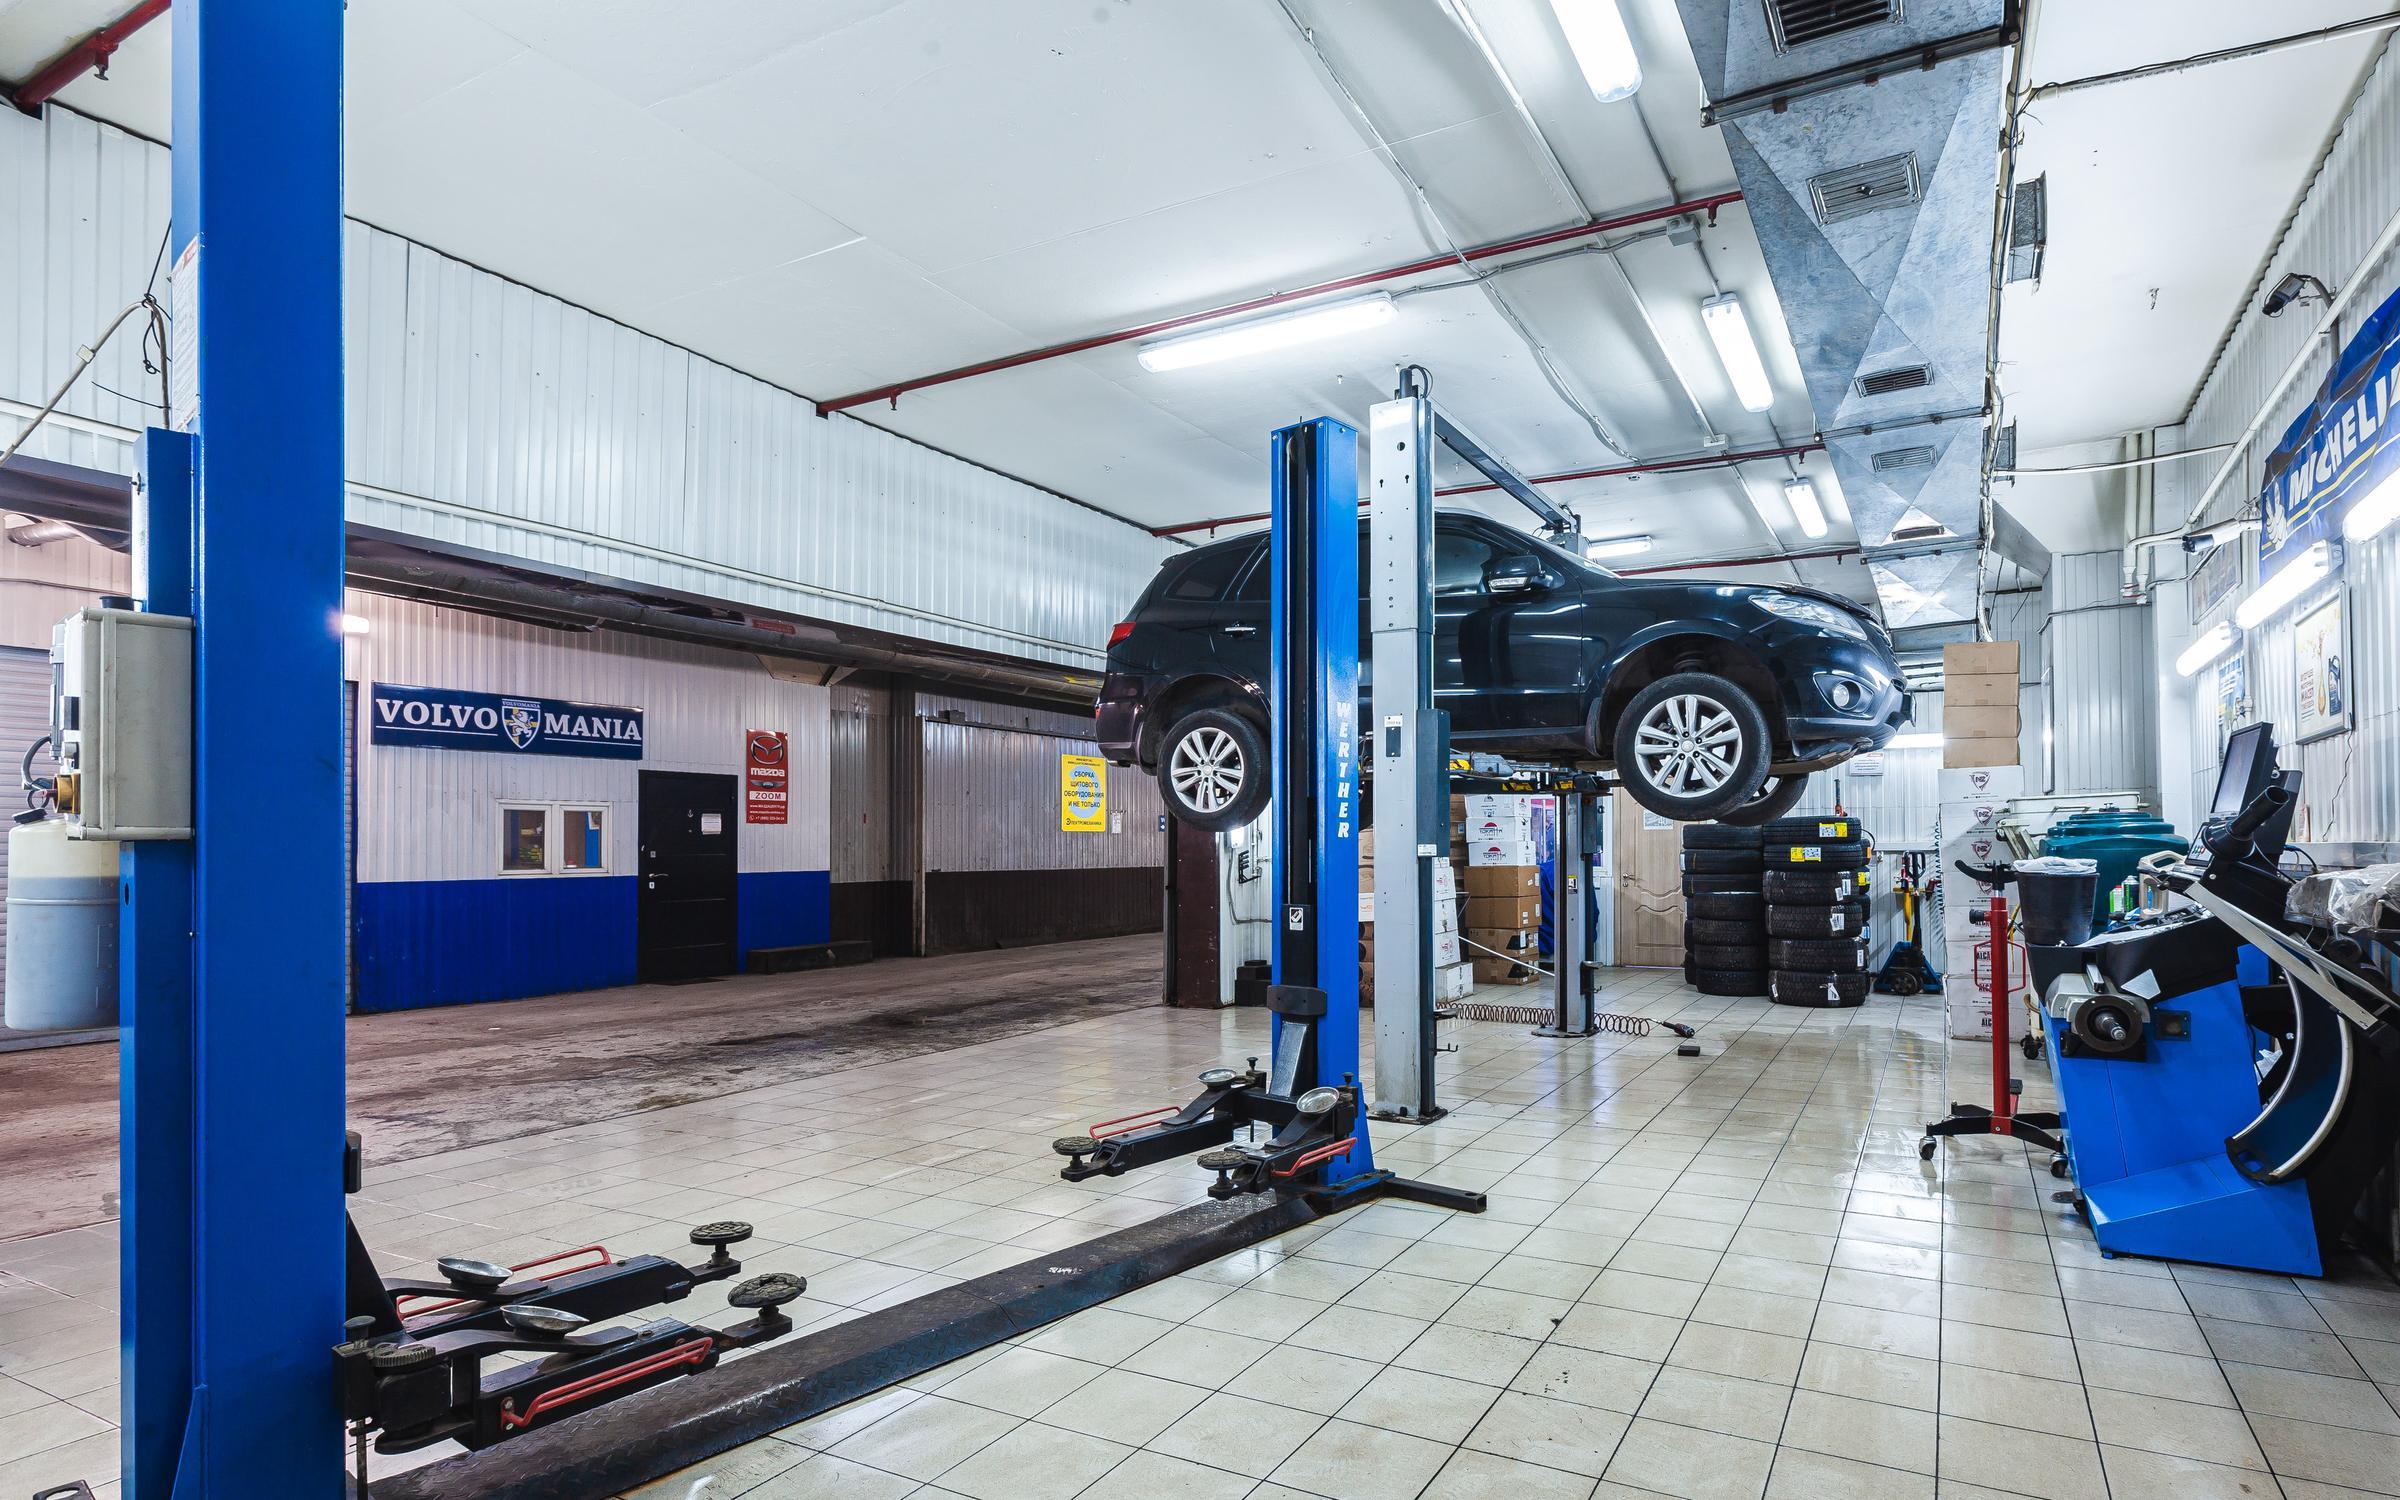 фотография Сервисного центра На Колесах.ru на метро Котельники